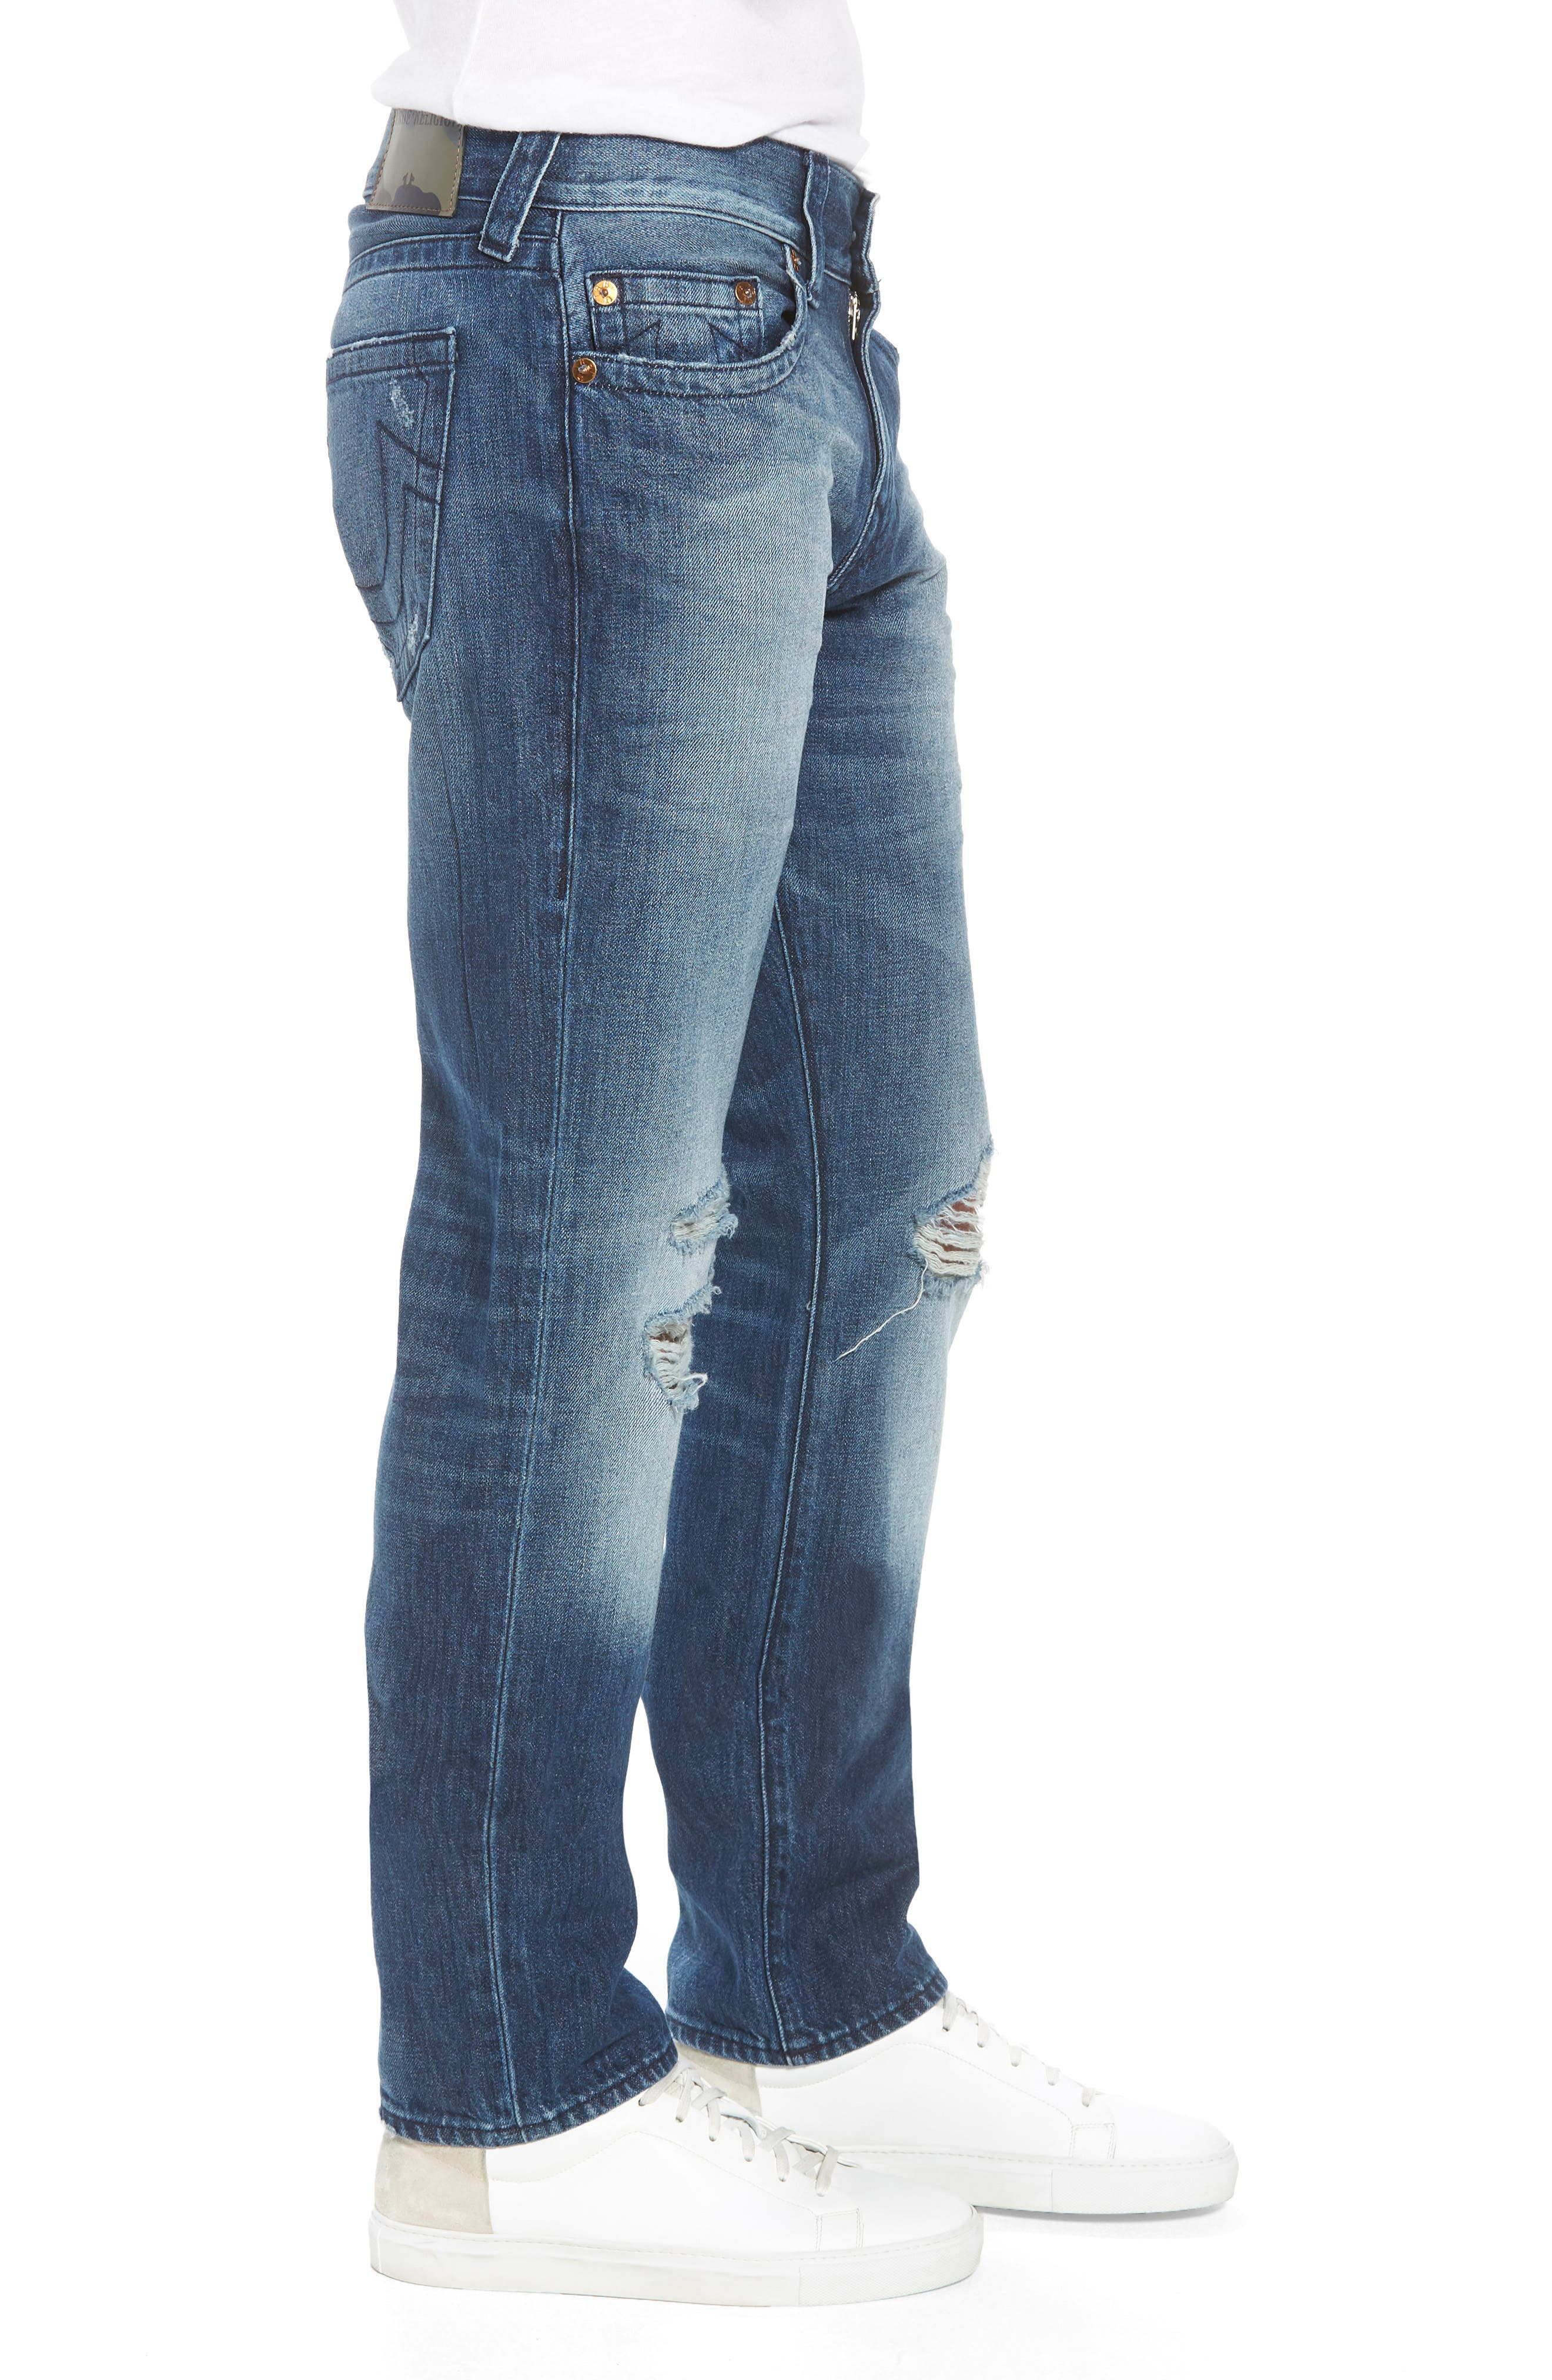 Geno Straight Leg Jeans,                             Alternate thumbnail 3, color,                             WORN SUSPECT